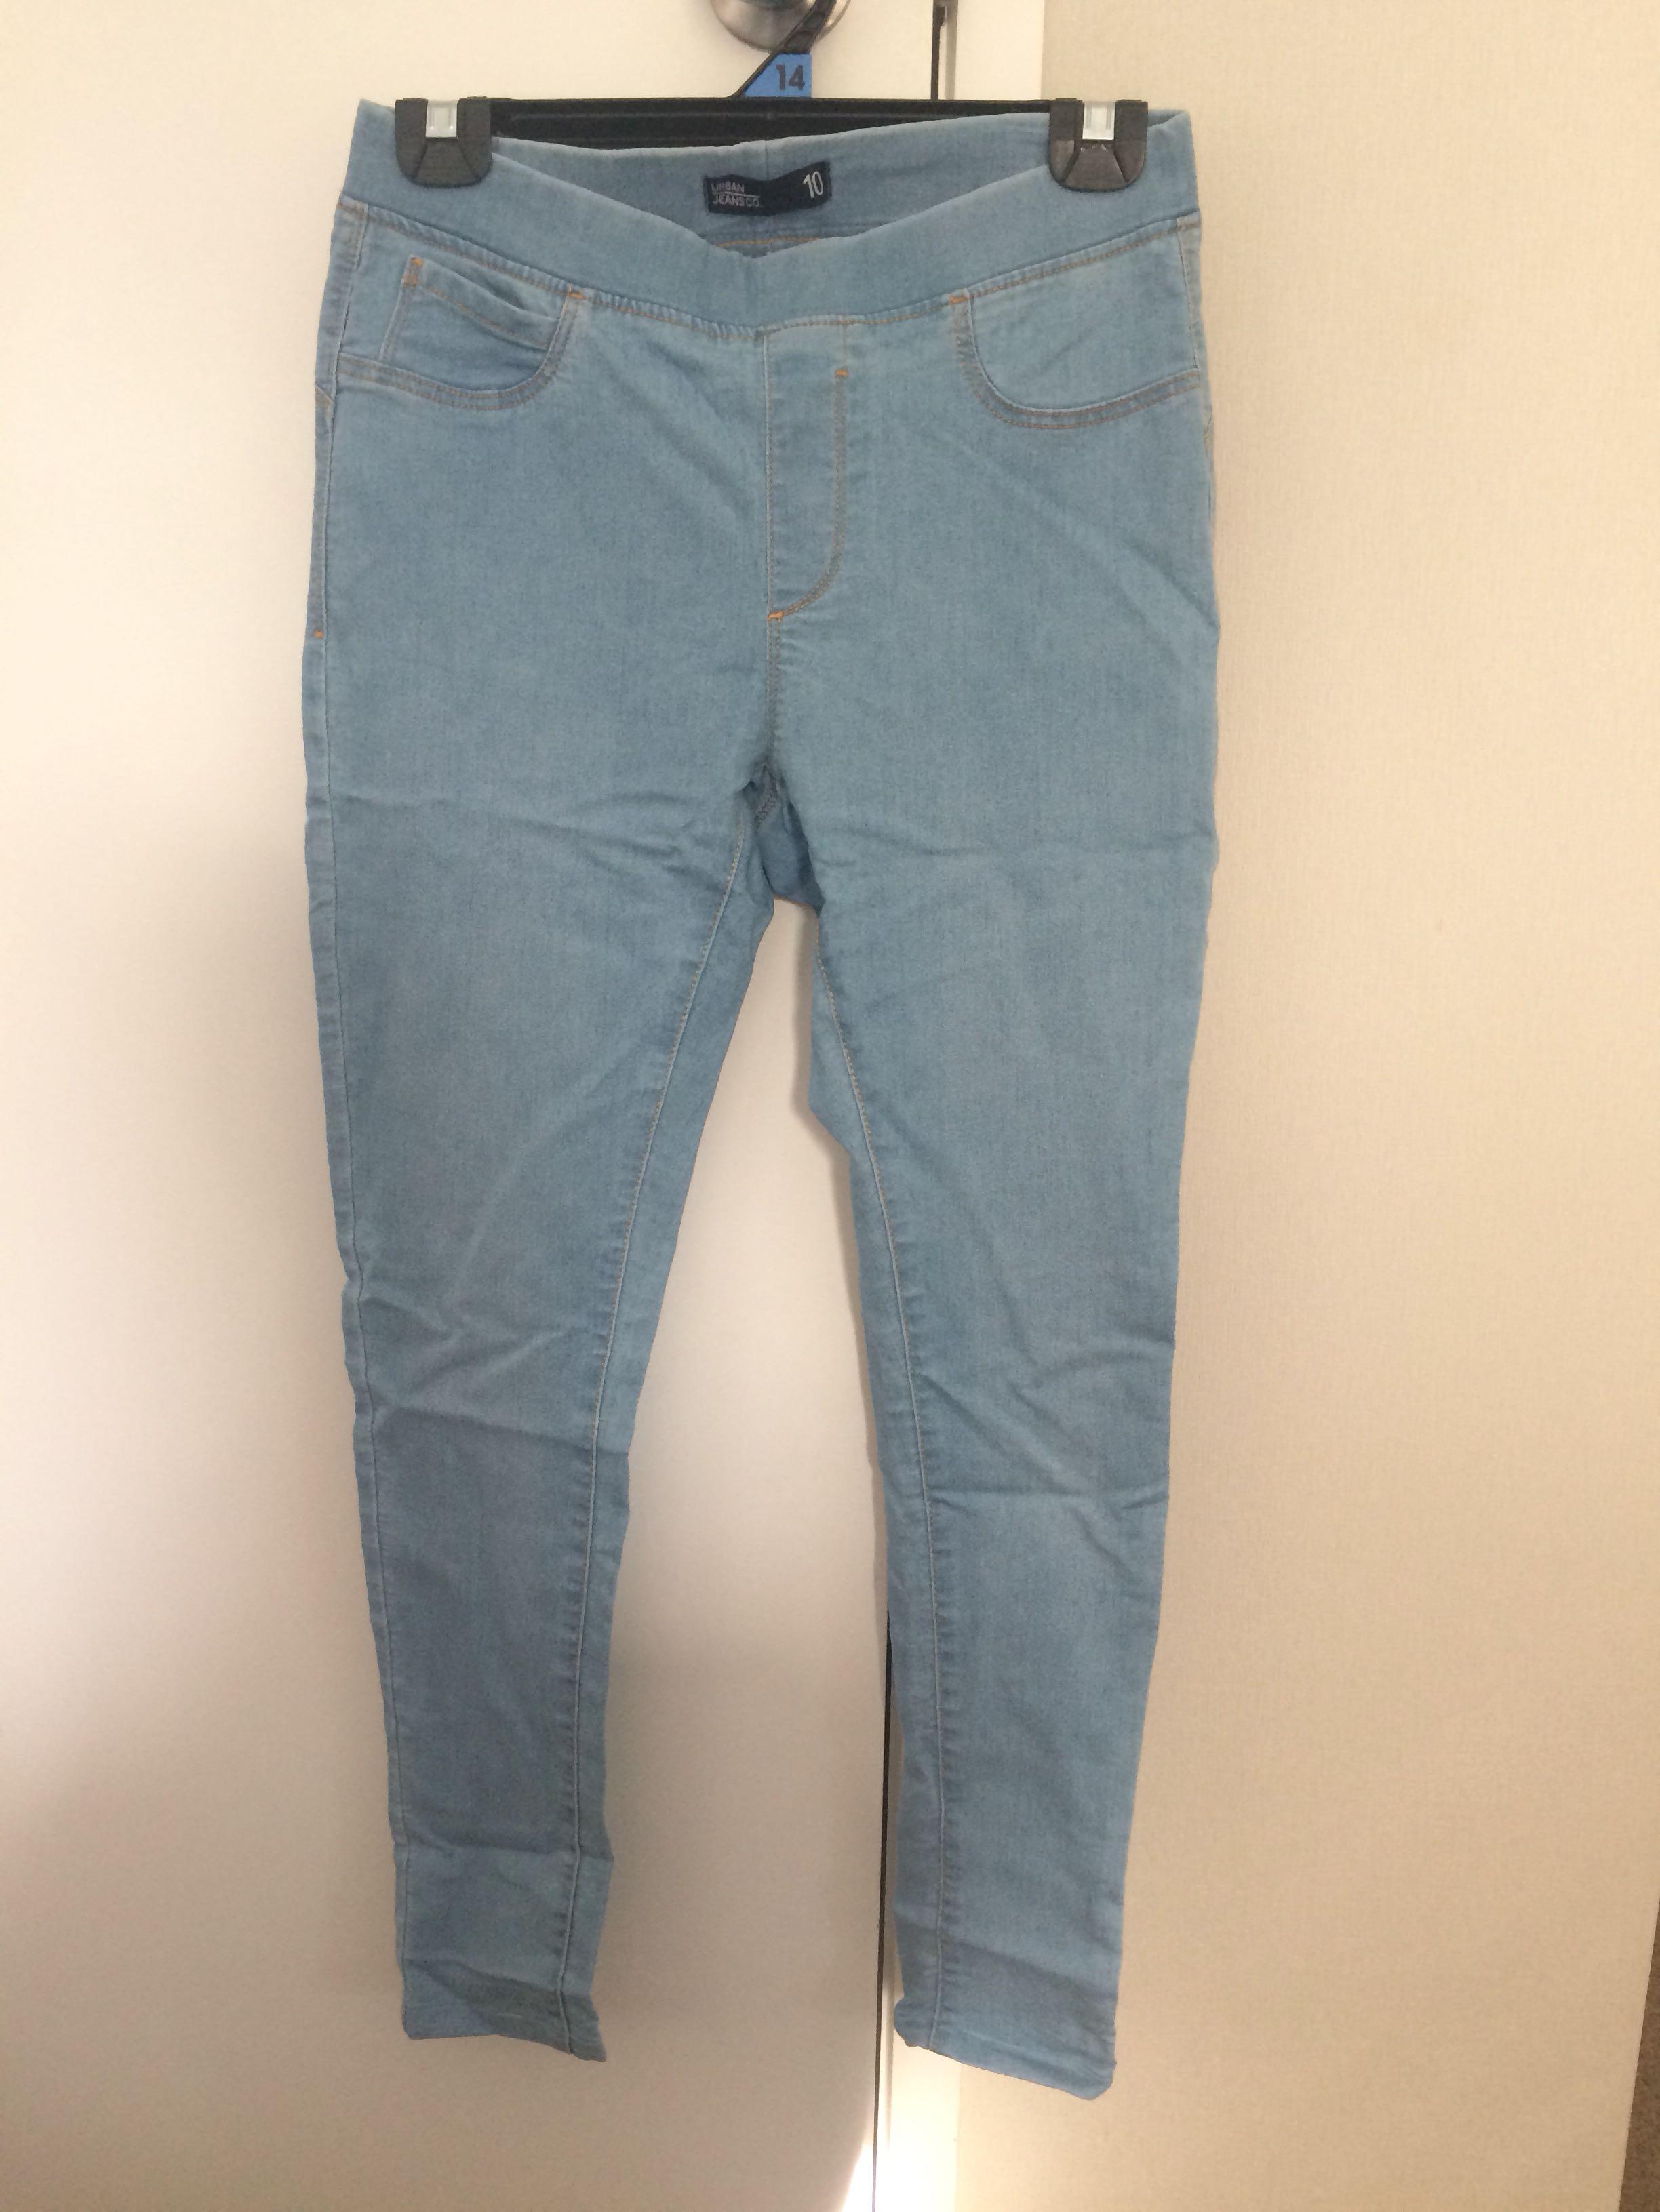 Size 10 jeans